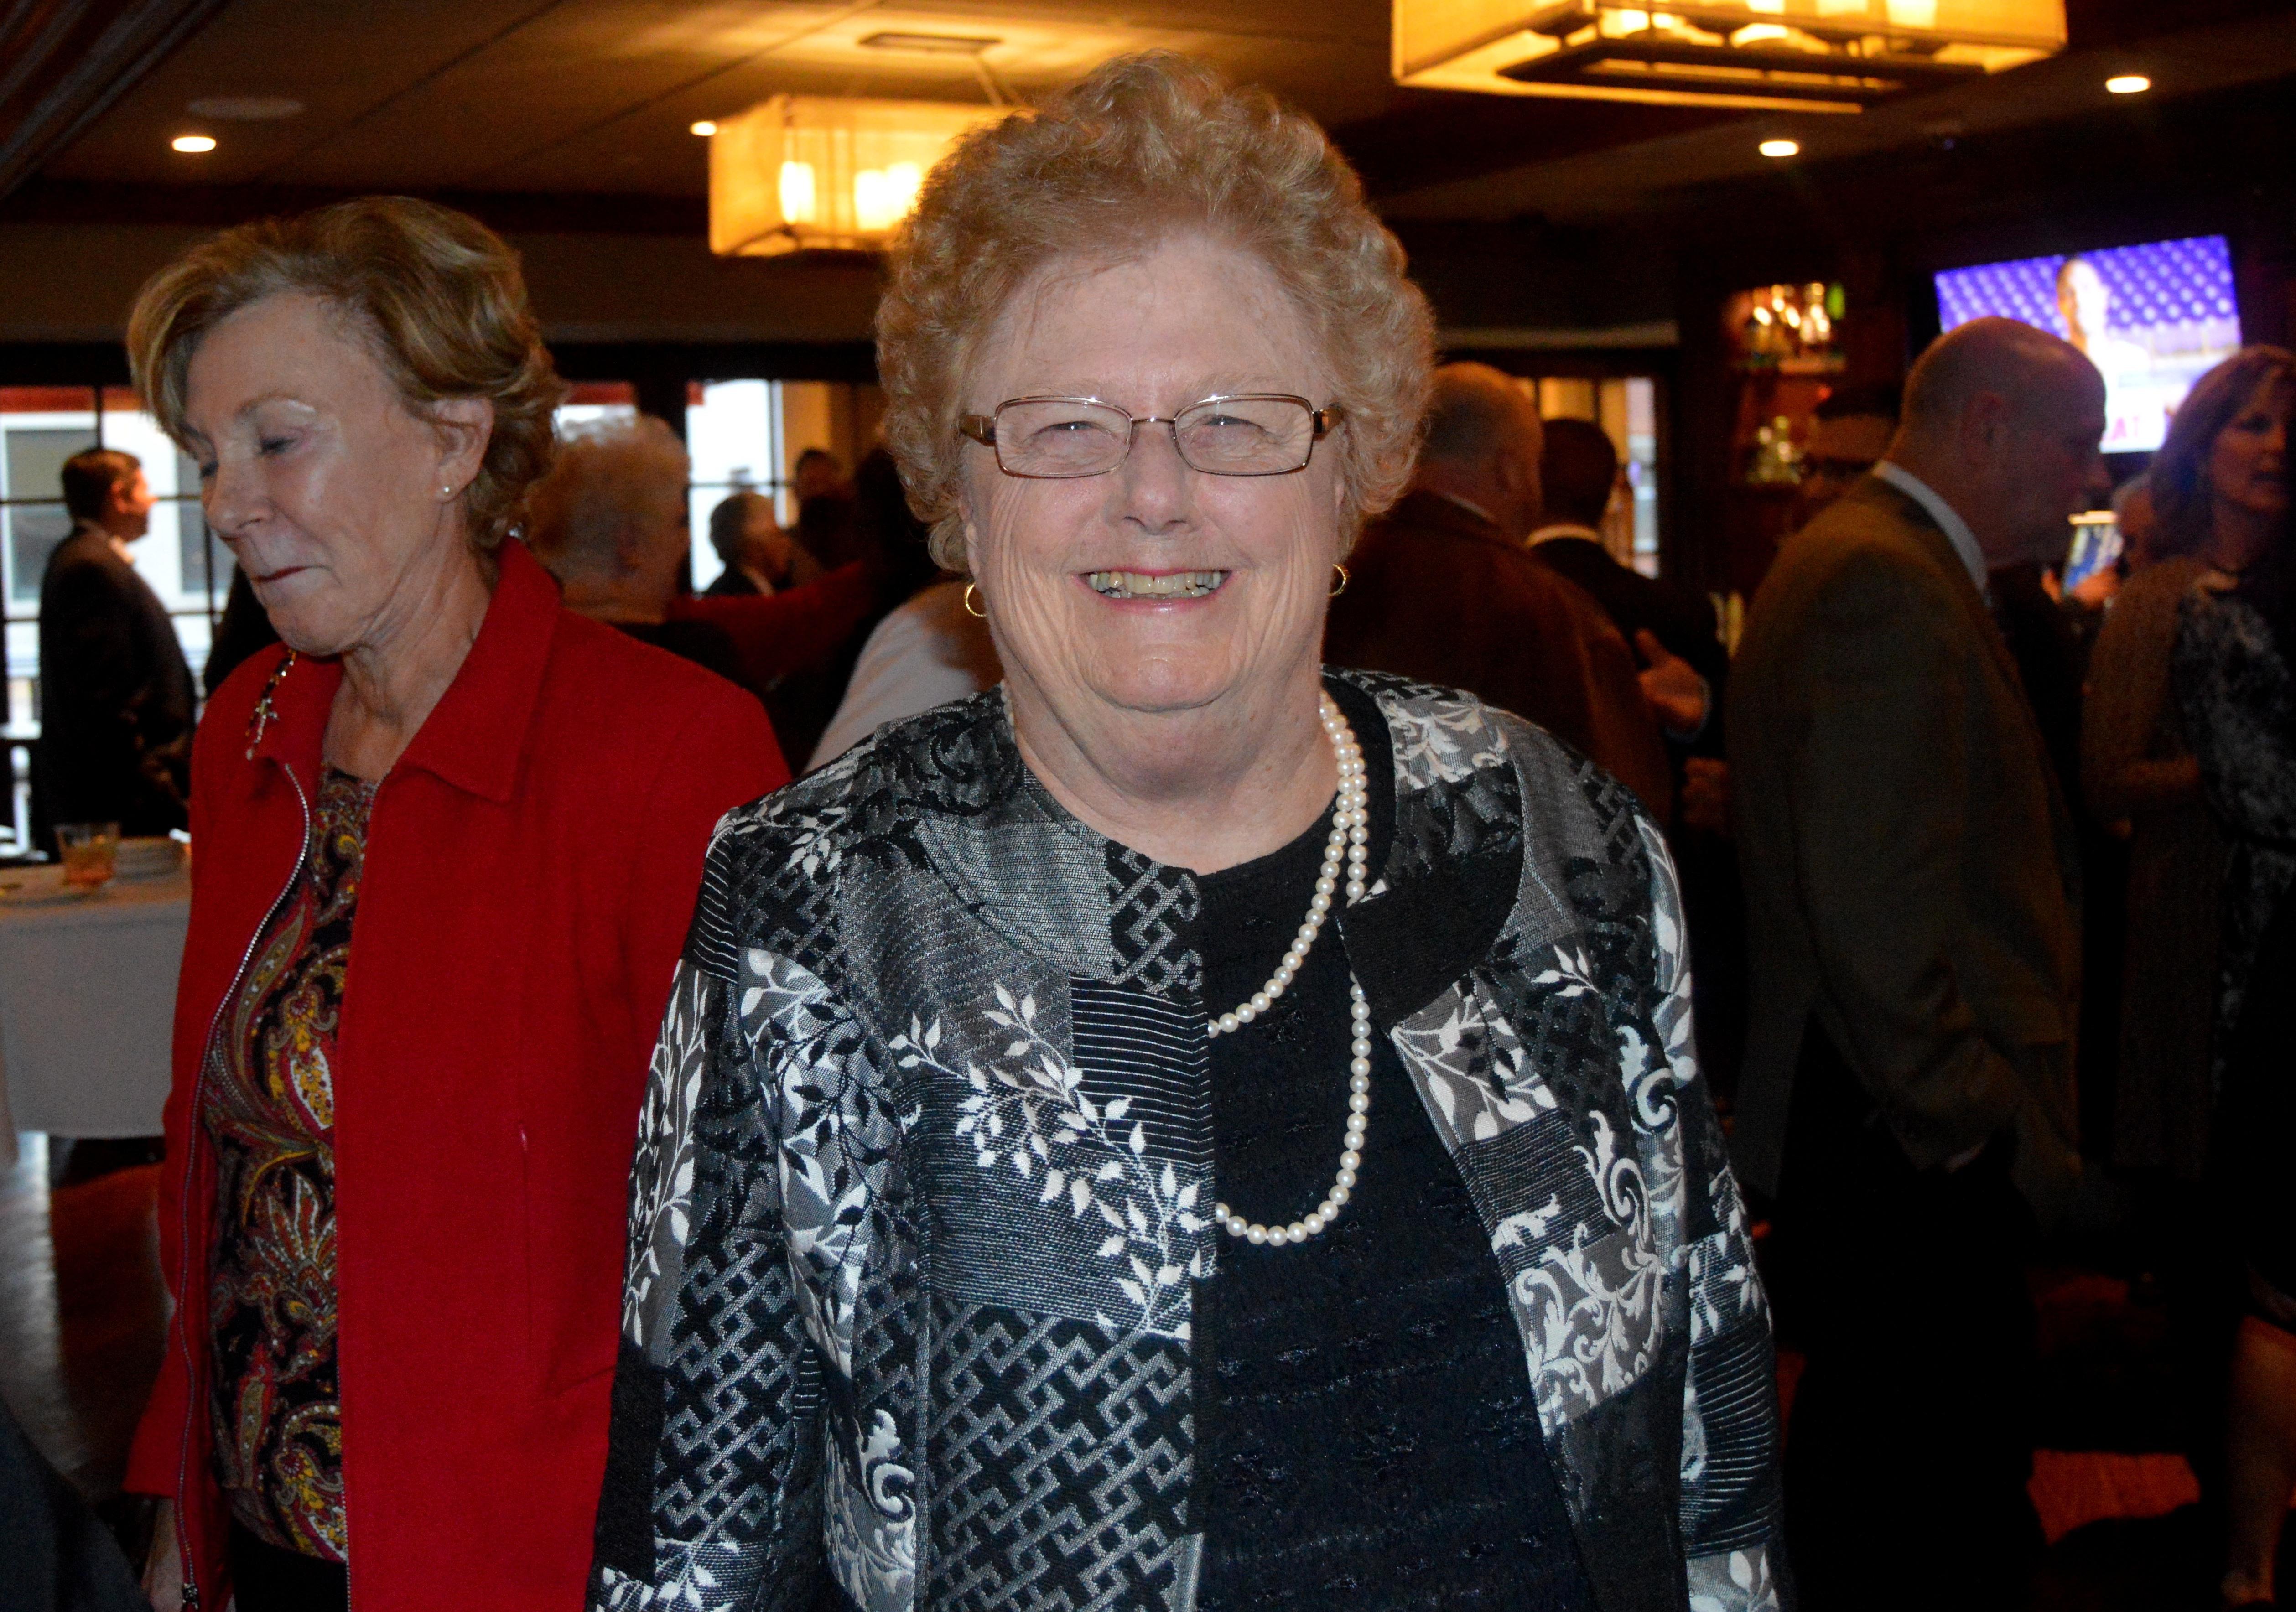 e7fabdfc6cc8f437f32d_Kathy_Mitchell__Fanwood_s_longest-serving_Council_member.JPG